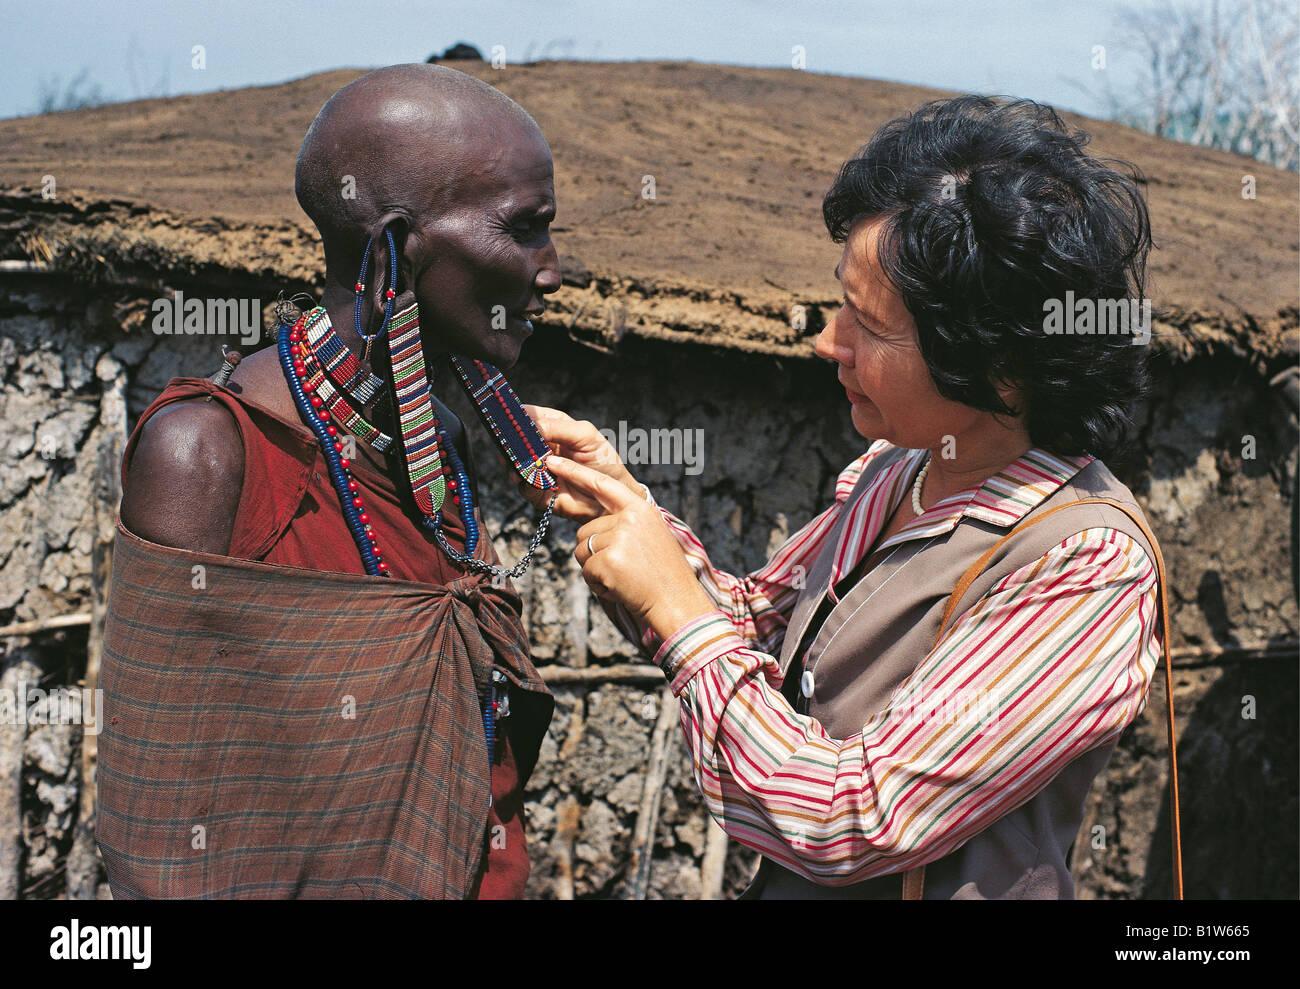 White lady tourist caucasian admiring Maasai woman s ear ornaments Masai Mara National Reserve Kenya East Africa - Stock Image